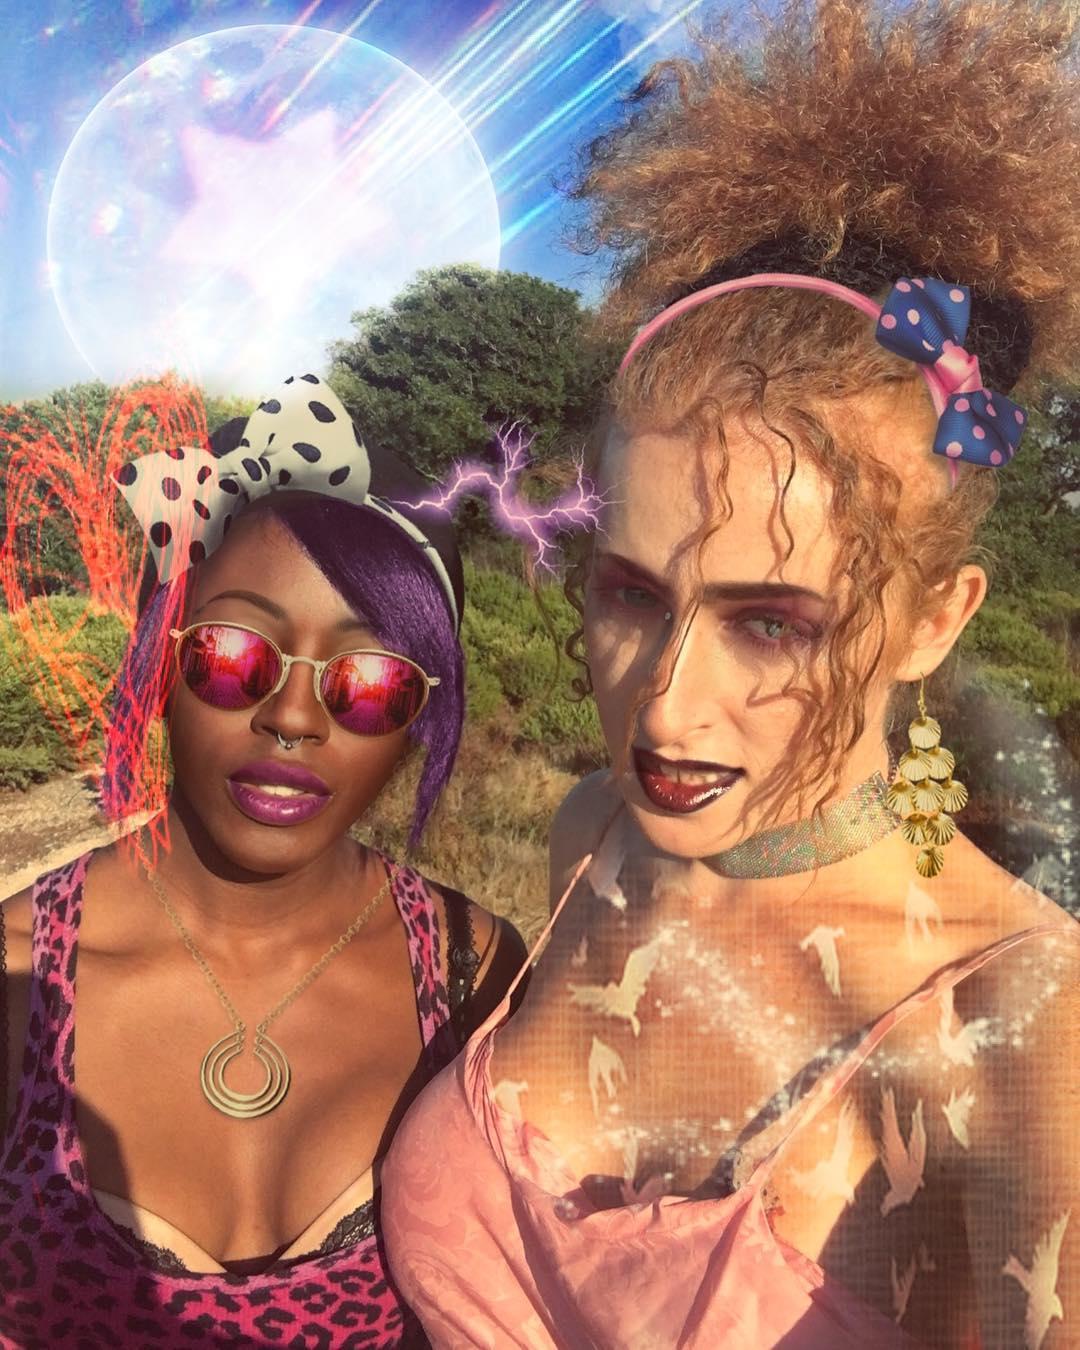 From Perls Instragram @perlesant  #LookWhoItIs  #UsAgain  #Gemini4Some  #BigSurprise  #DatingMyWife  #TheMoonToo   #PsychicLesbians  #GayAssWomen  #ExtraGirly  #BowsInTheHair  #HikeDykes   #YochevedSaysHi  #HerOnlinePresenceSaysHi  #LesbianWombyn  #ShemalianTraps   #Tallgirls # TallGirl4TallGirl  #TransLesbian  #Pokemon  #FFS  #TopSurgery  #GuessWutsNext   #Transformers  #GayBitches  #FreakSluts  #Queenz  #Wombyn  #TheBoobsOfItAll   #MyBoobIsEatingHerBoob  #😱